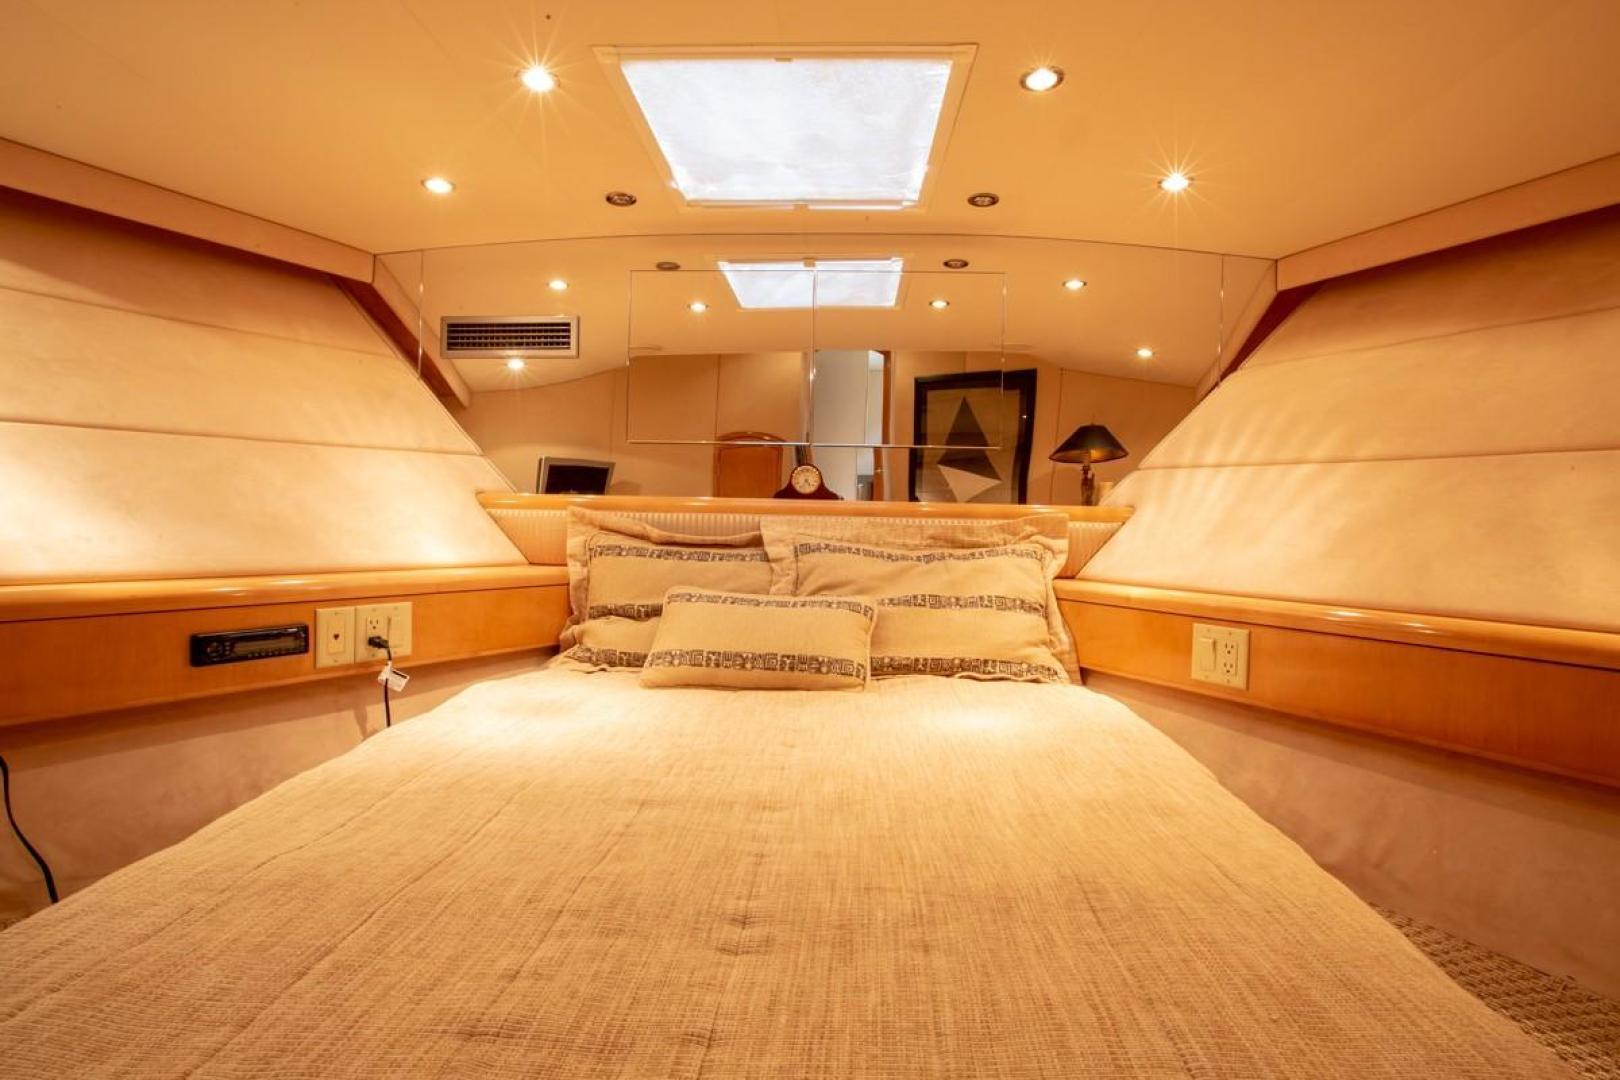 Hatteras-Cockpit Motor Yacht 2000-Getaway Ft. Lauderdale-Florida-United States-977392 | Thumbnail